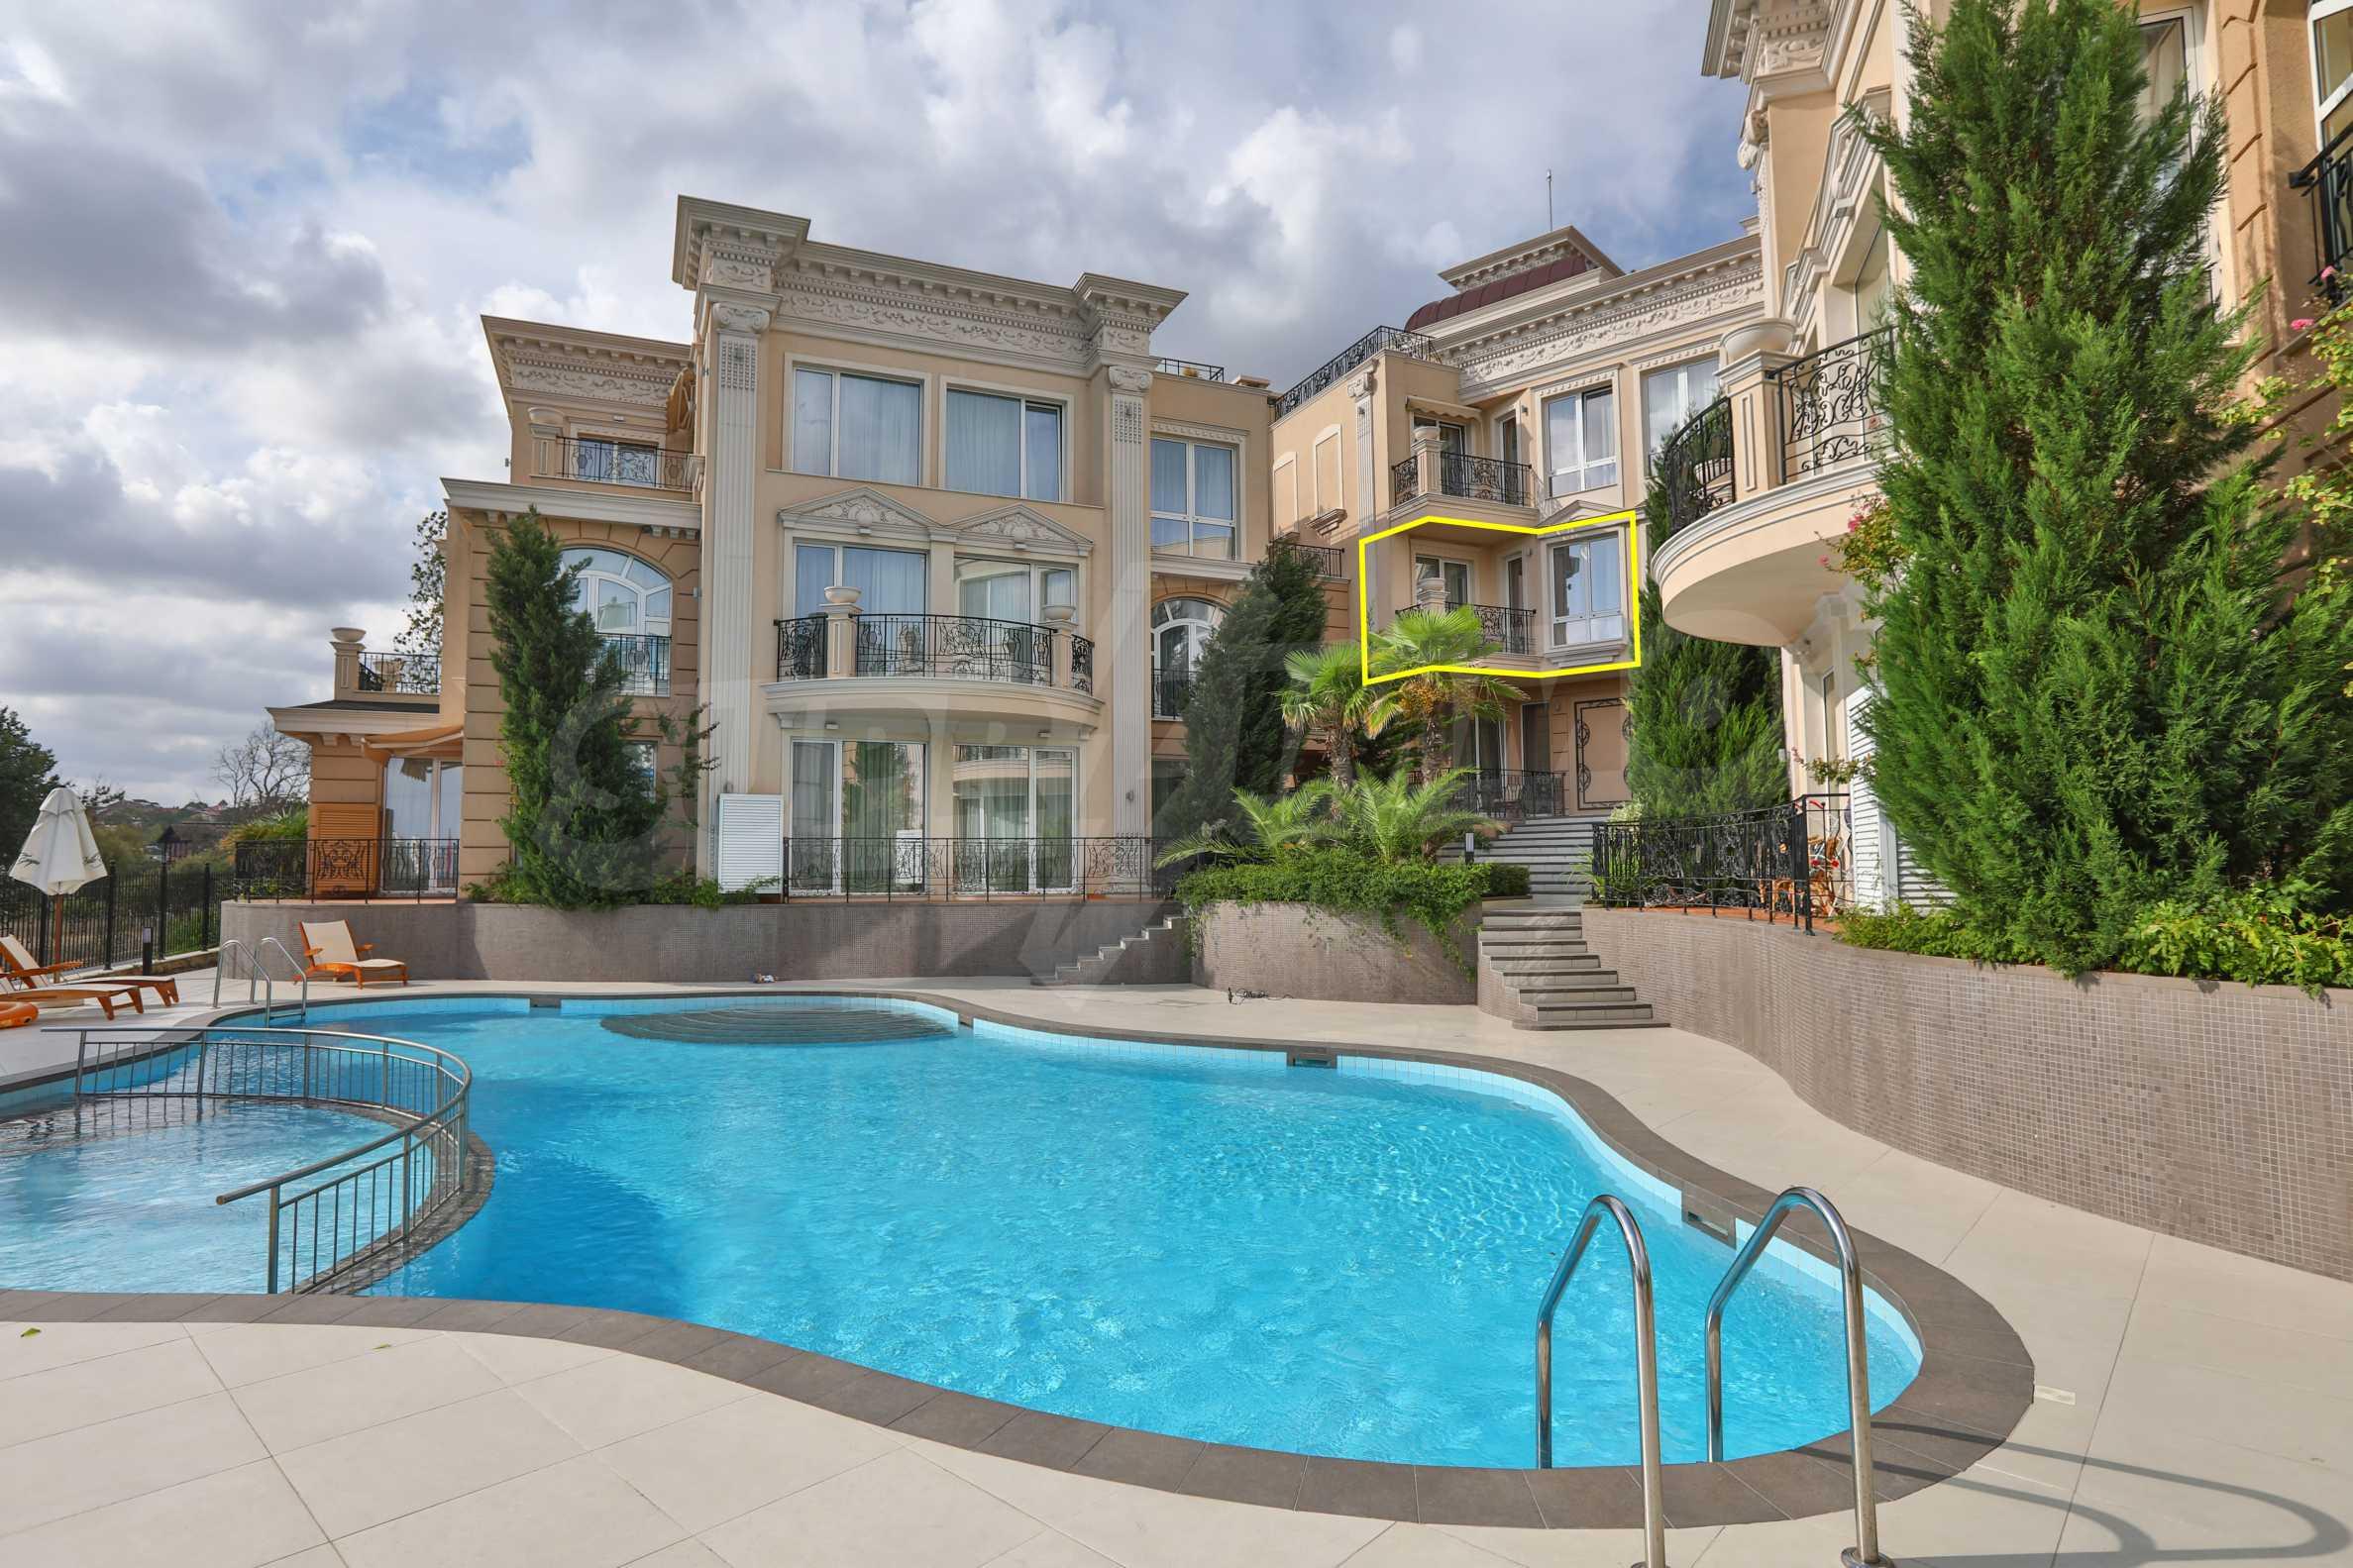 Дизайнерски тристаен апартамент под наем за летен сезон в резиденция Belle Époque в Лозенец 45